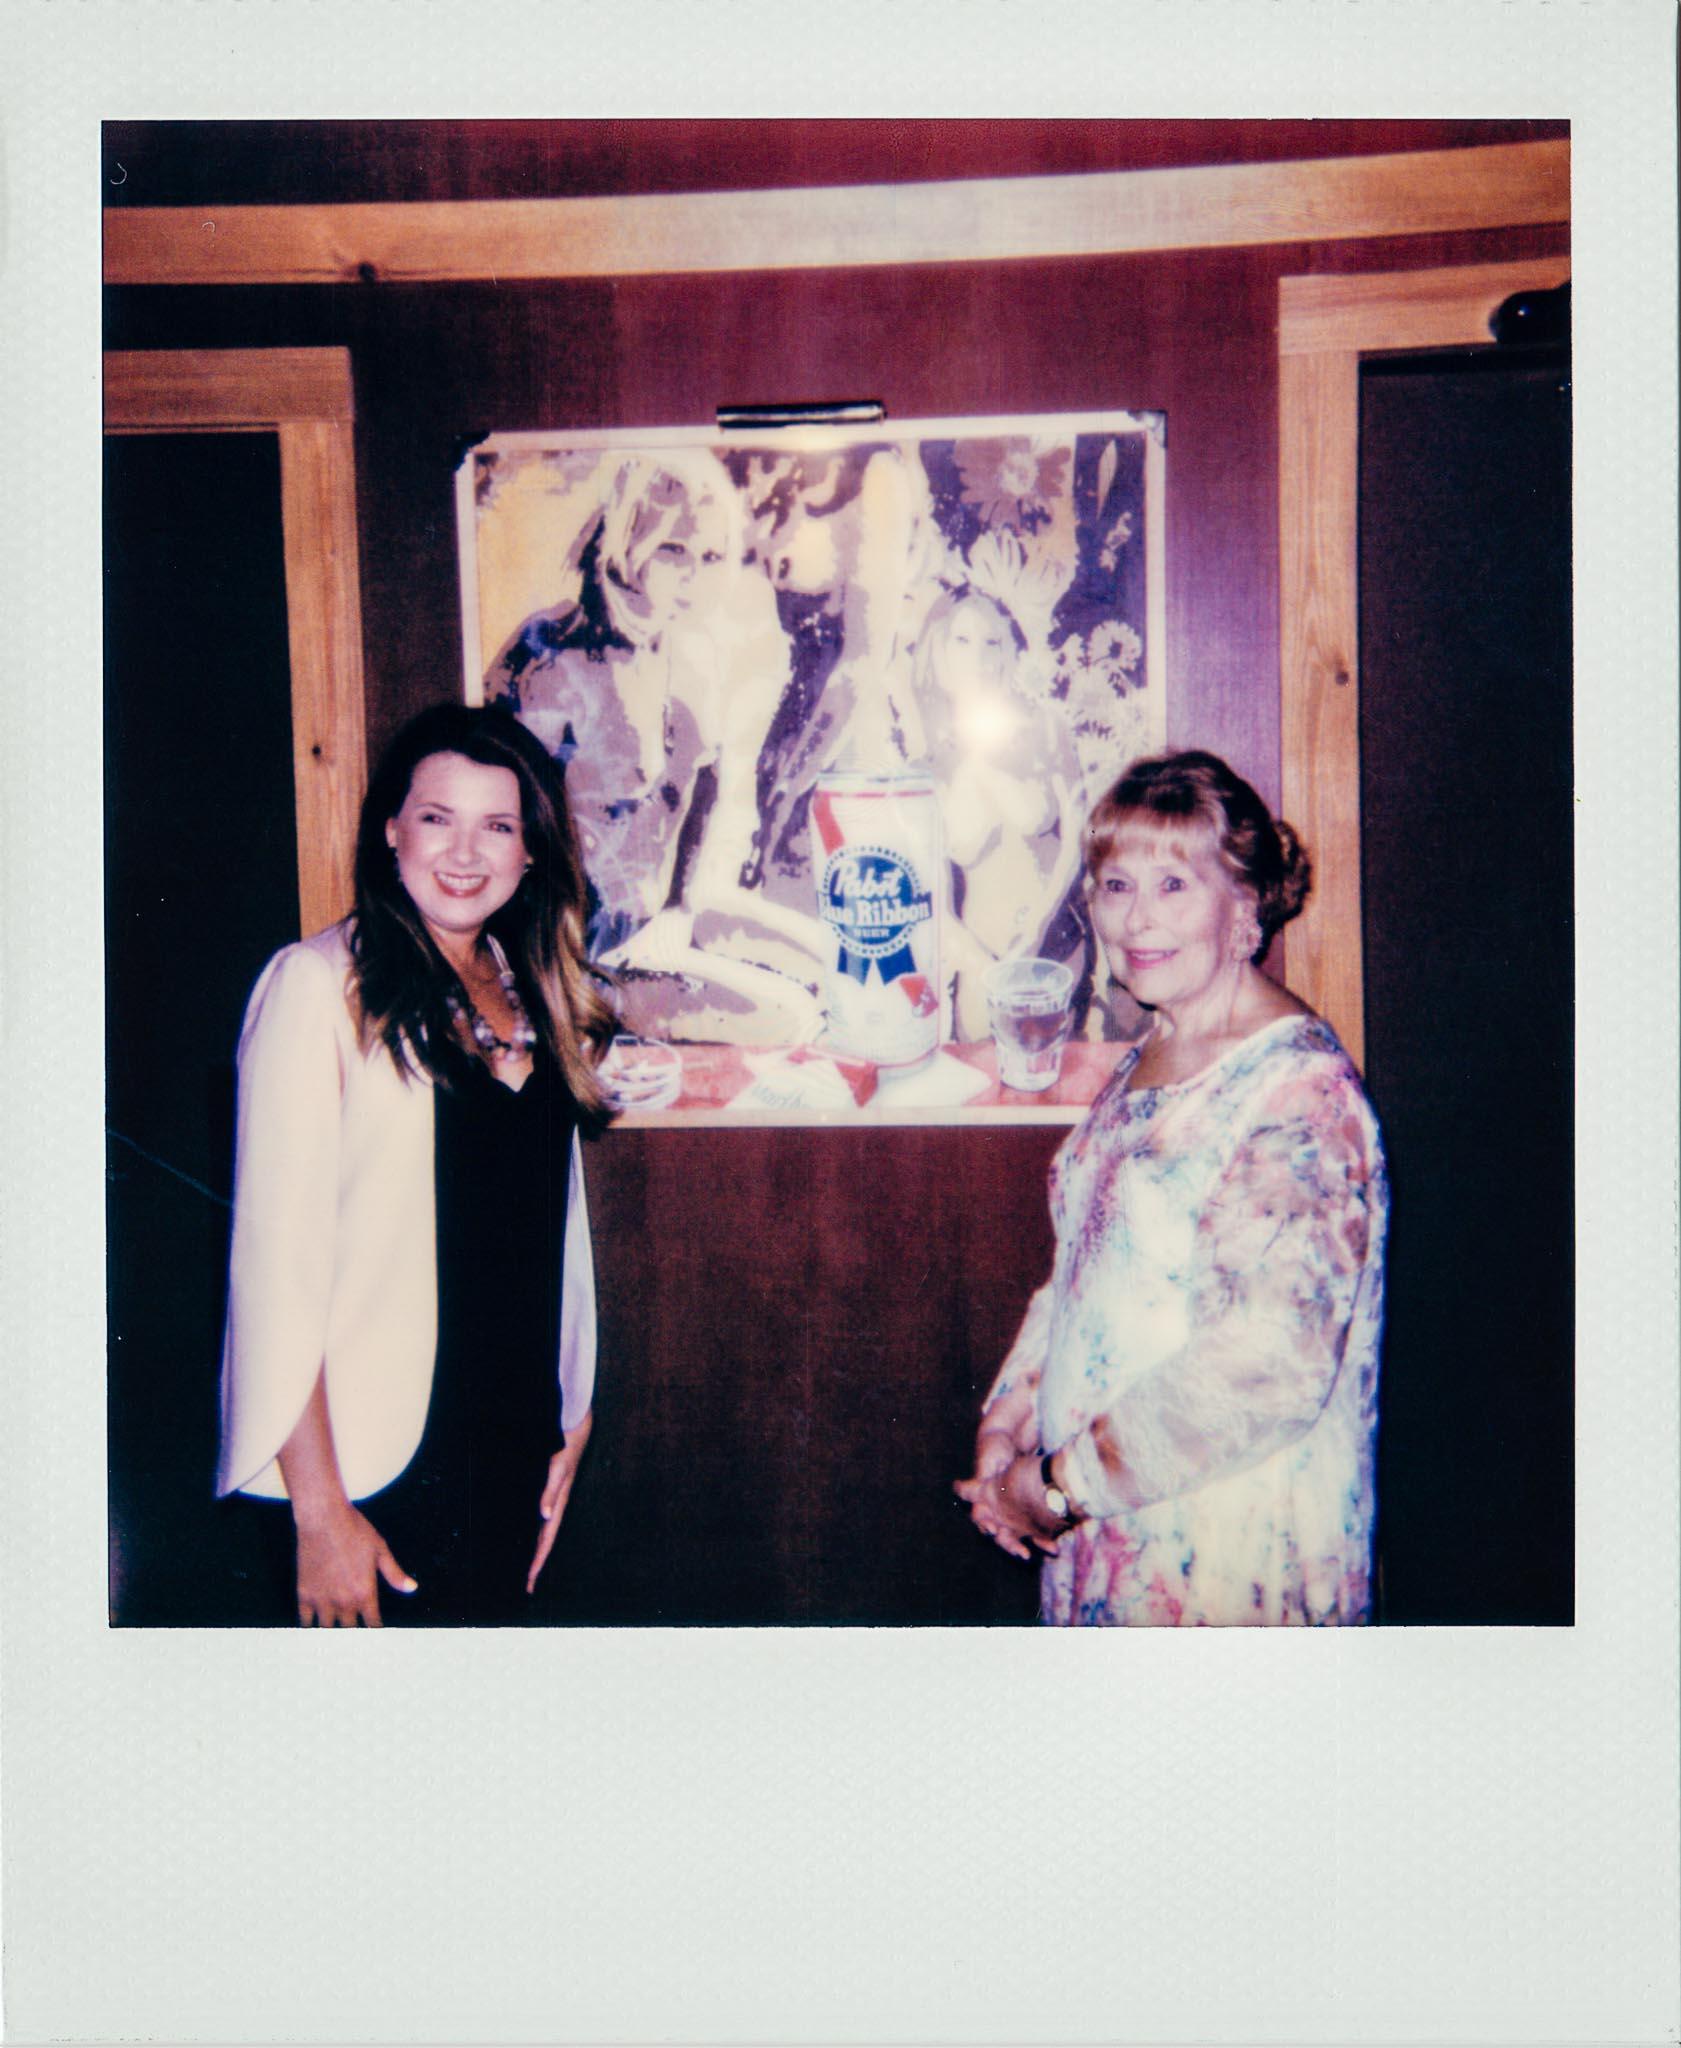 Linda-Updike-Lauren-Ferriola-Polaroid.jpg